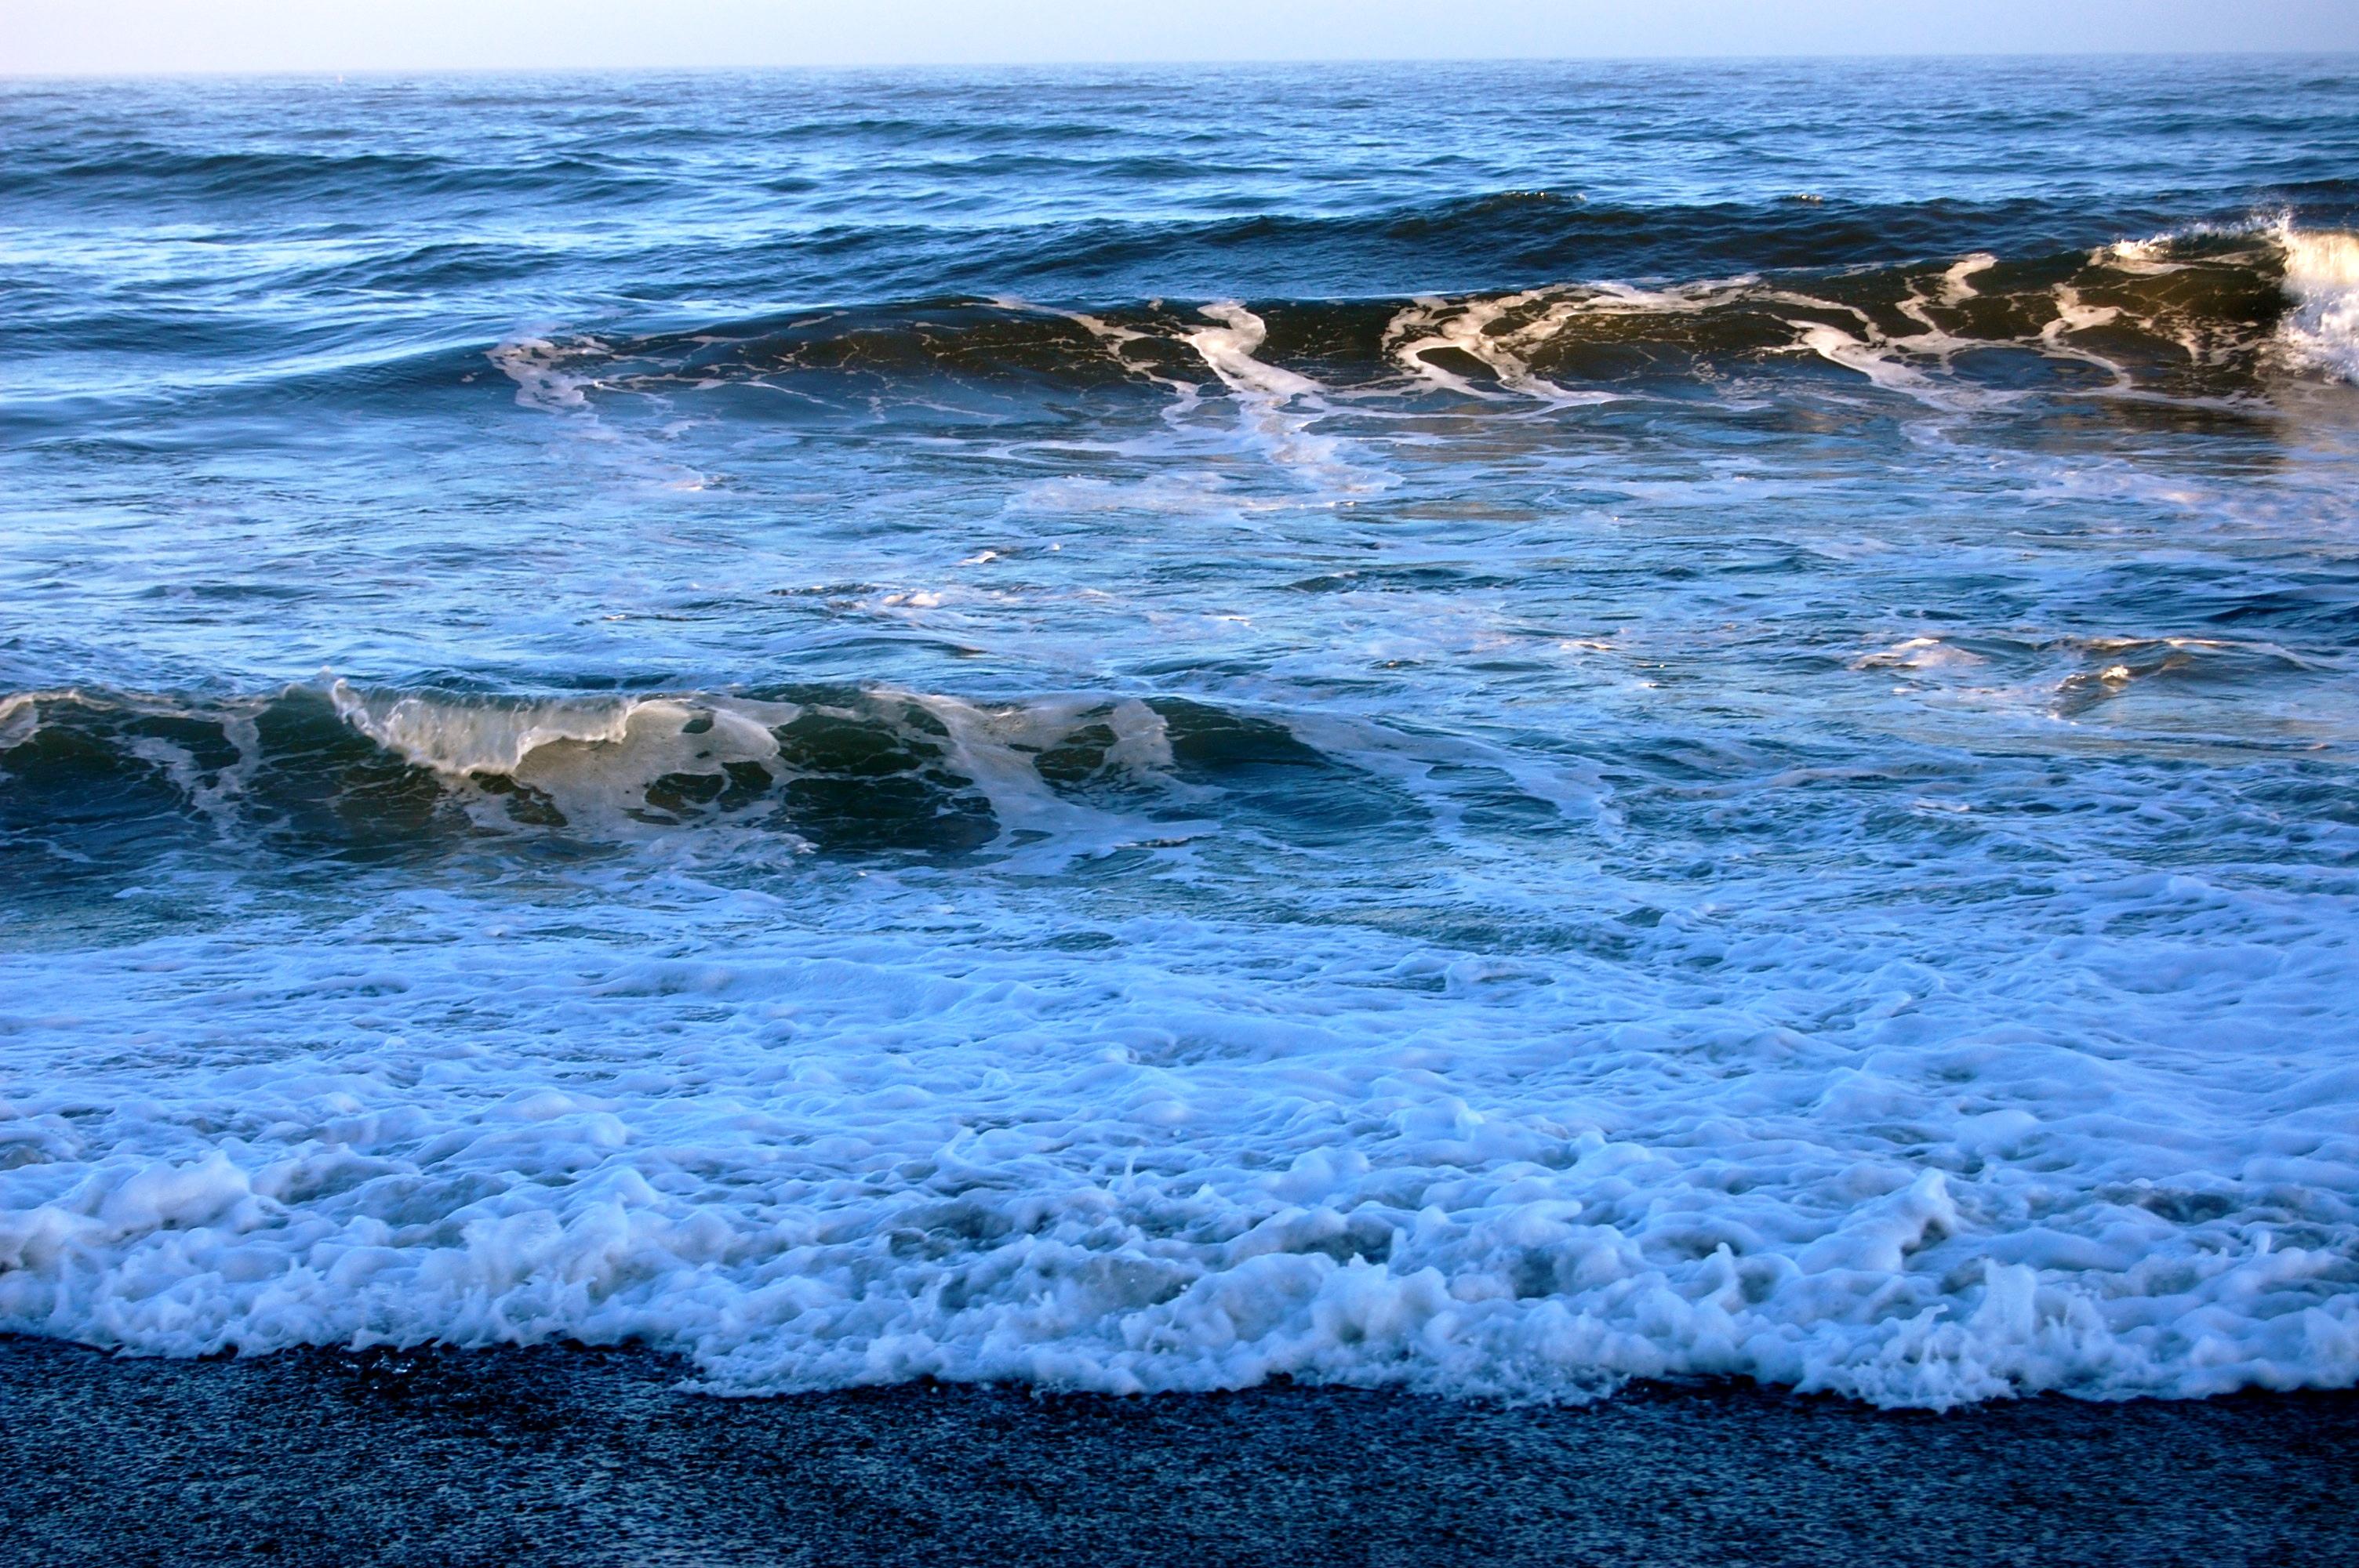 Sun Kissing the Ocean